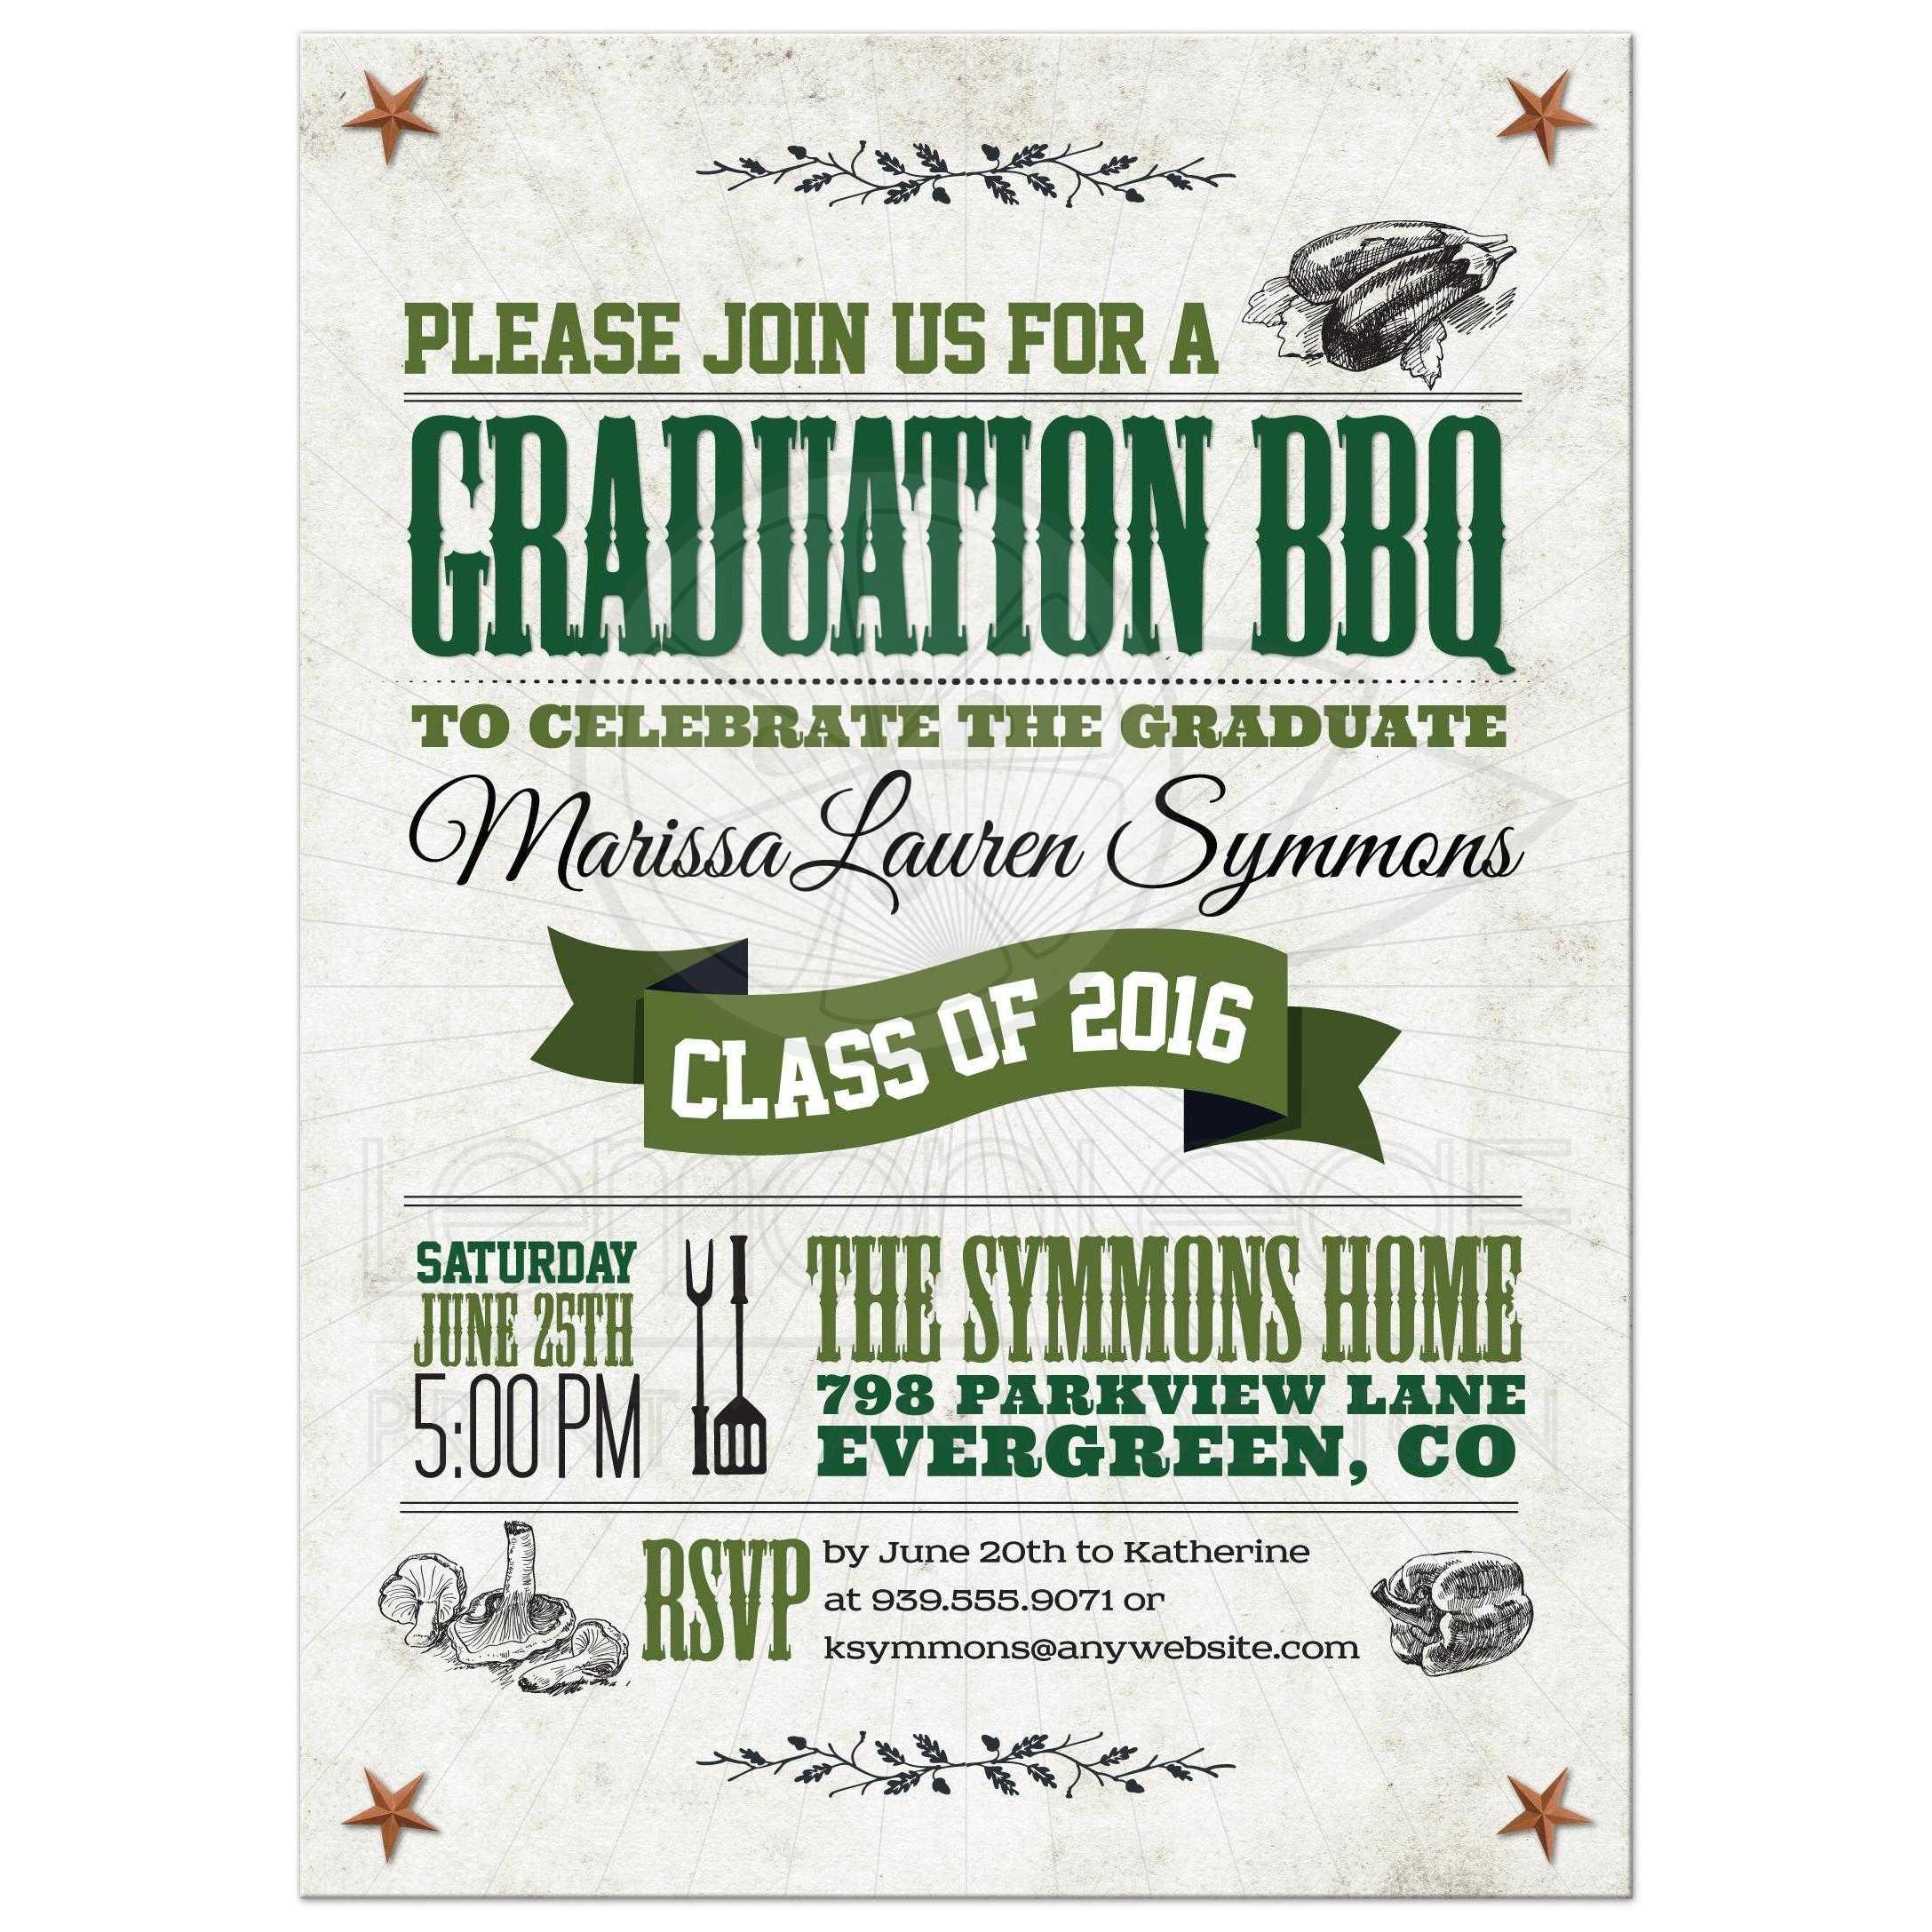 Graduation Party Invitation Rustic Vegetarian Vegan BBQ Green Brown